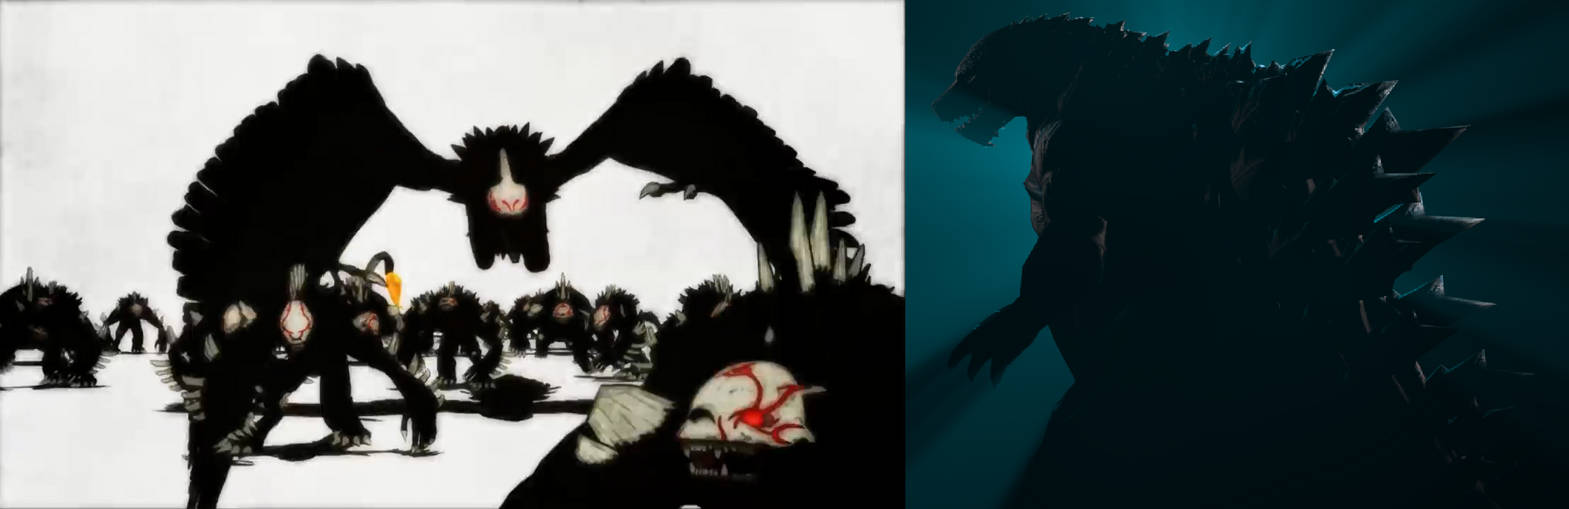 Godzilla WOR - Grimm and Titans by Sideswipe217 on DeviantArt